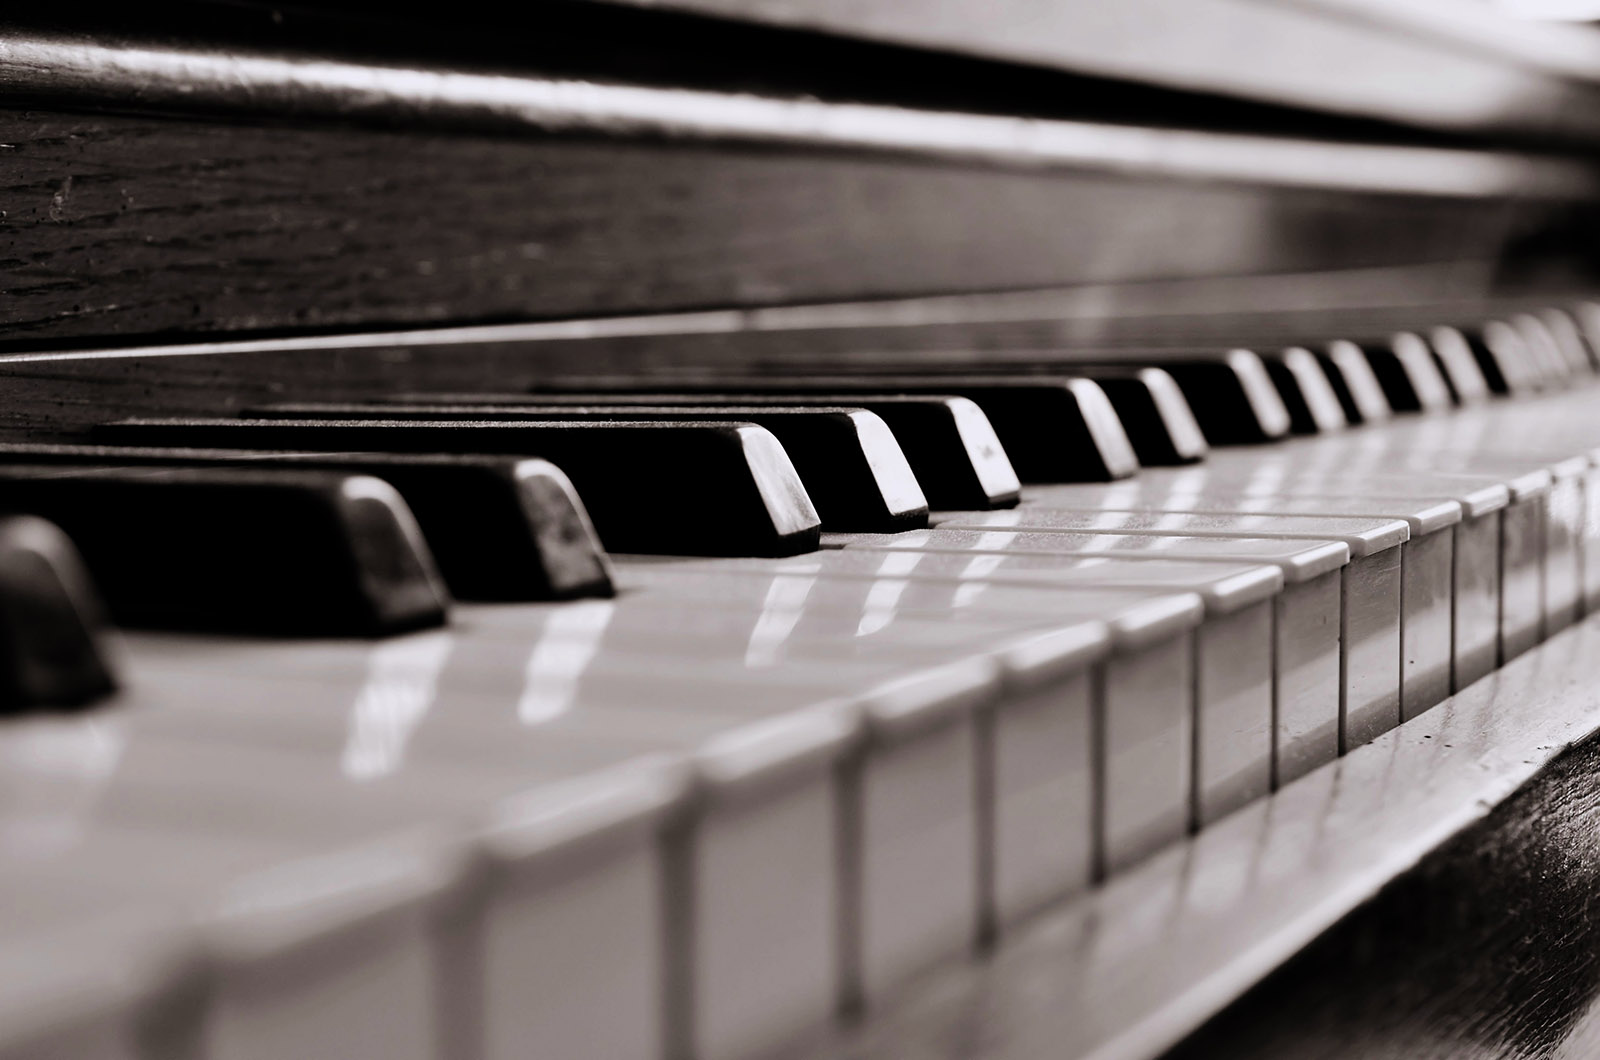 Komorný koncert – Slovenská klavírna tvorba